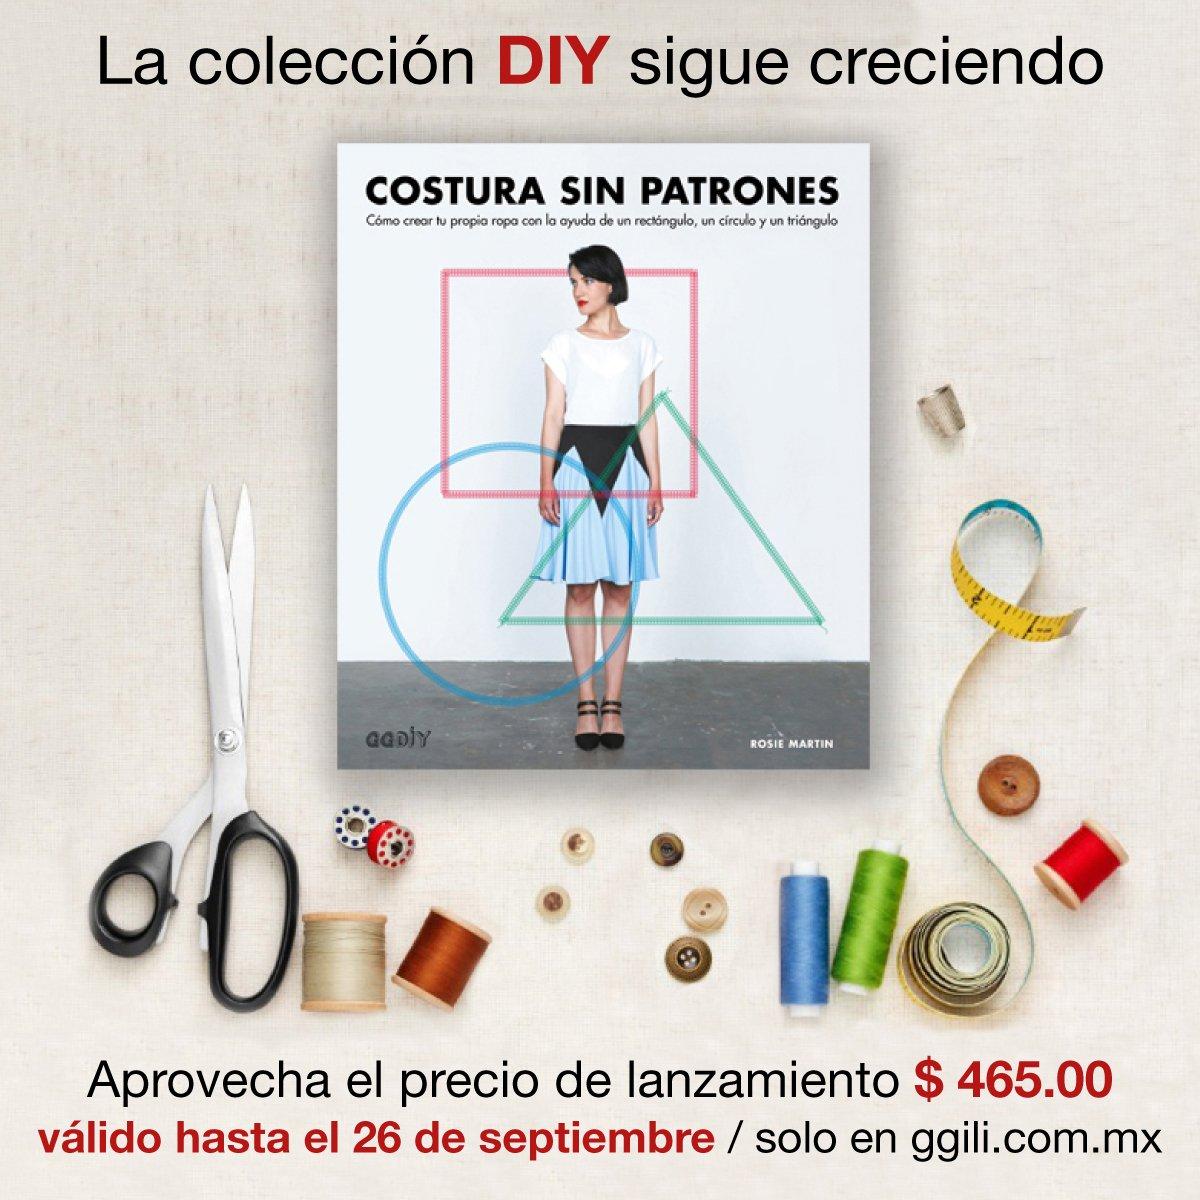 Costura sin patrones - Rosie Martin - Editorial Gustavo Gili (MX)